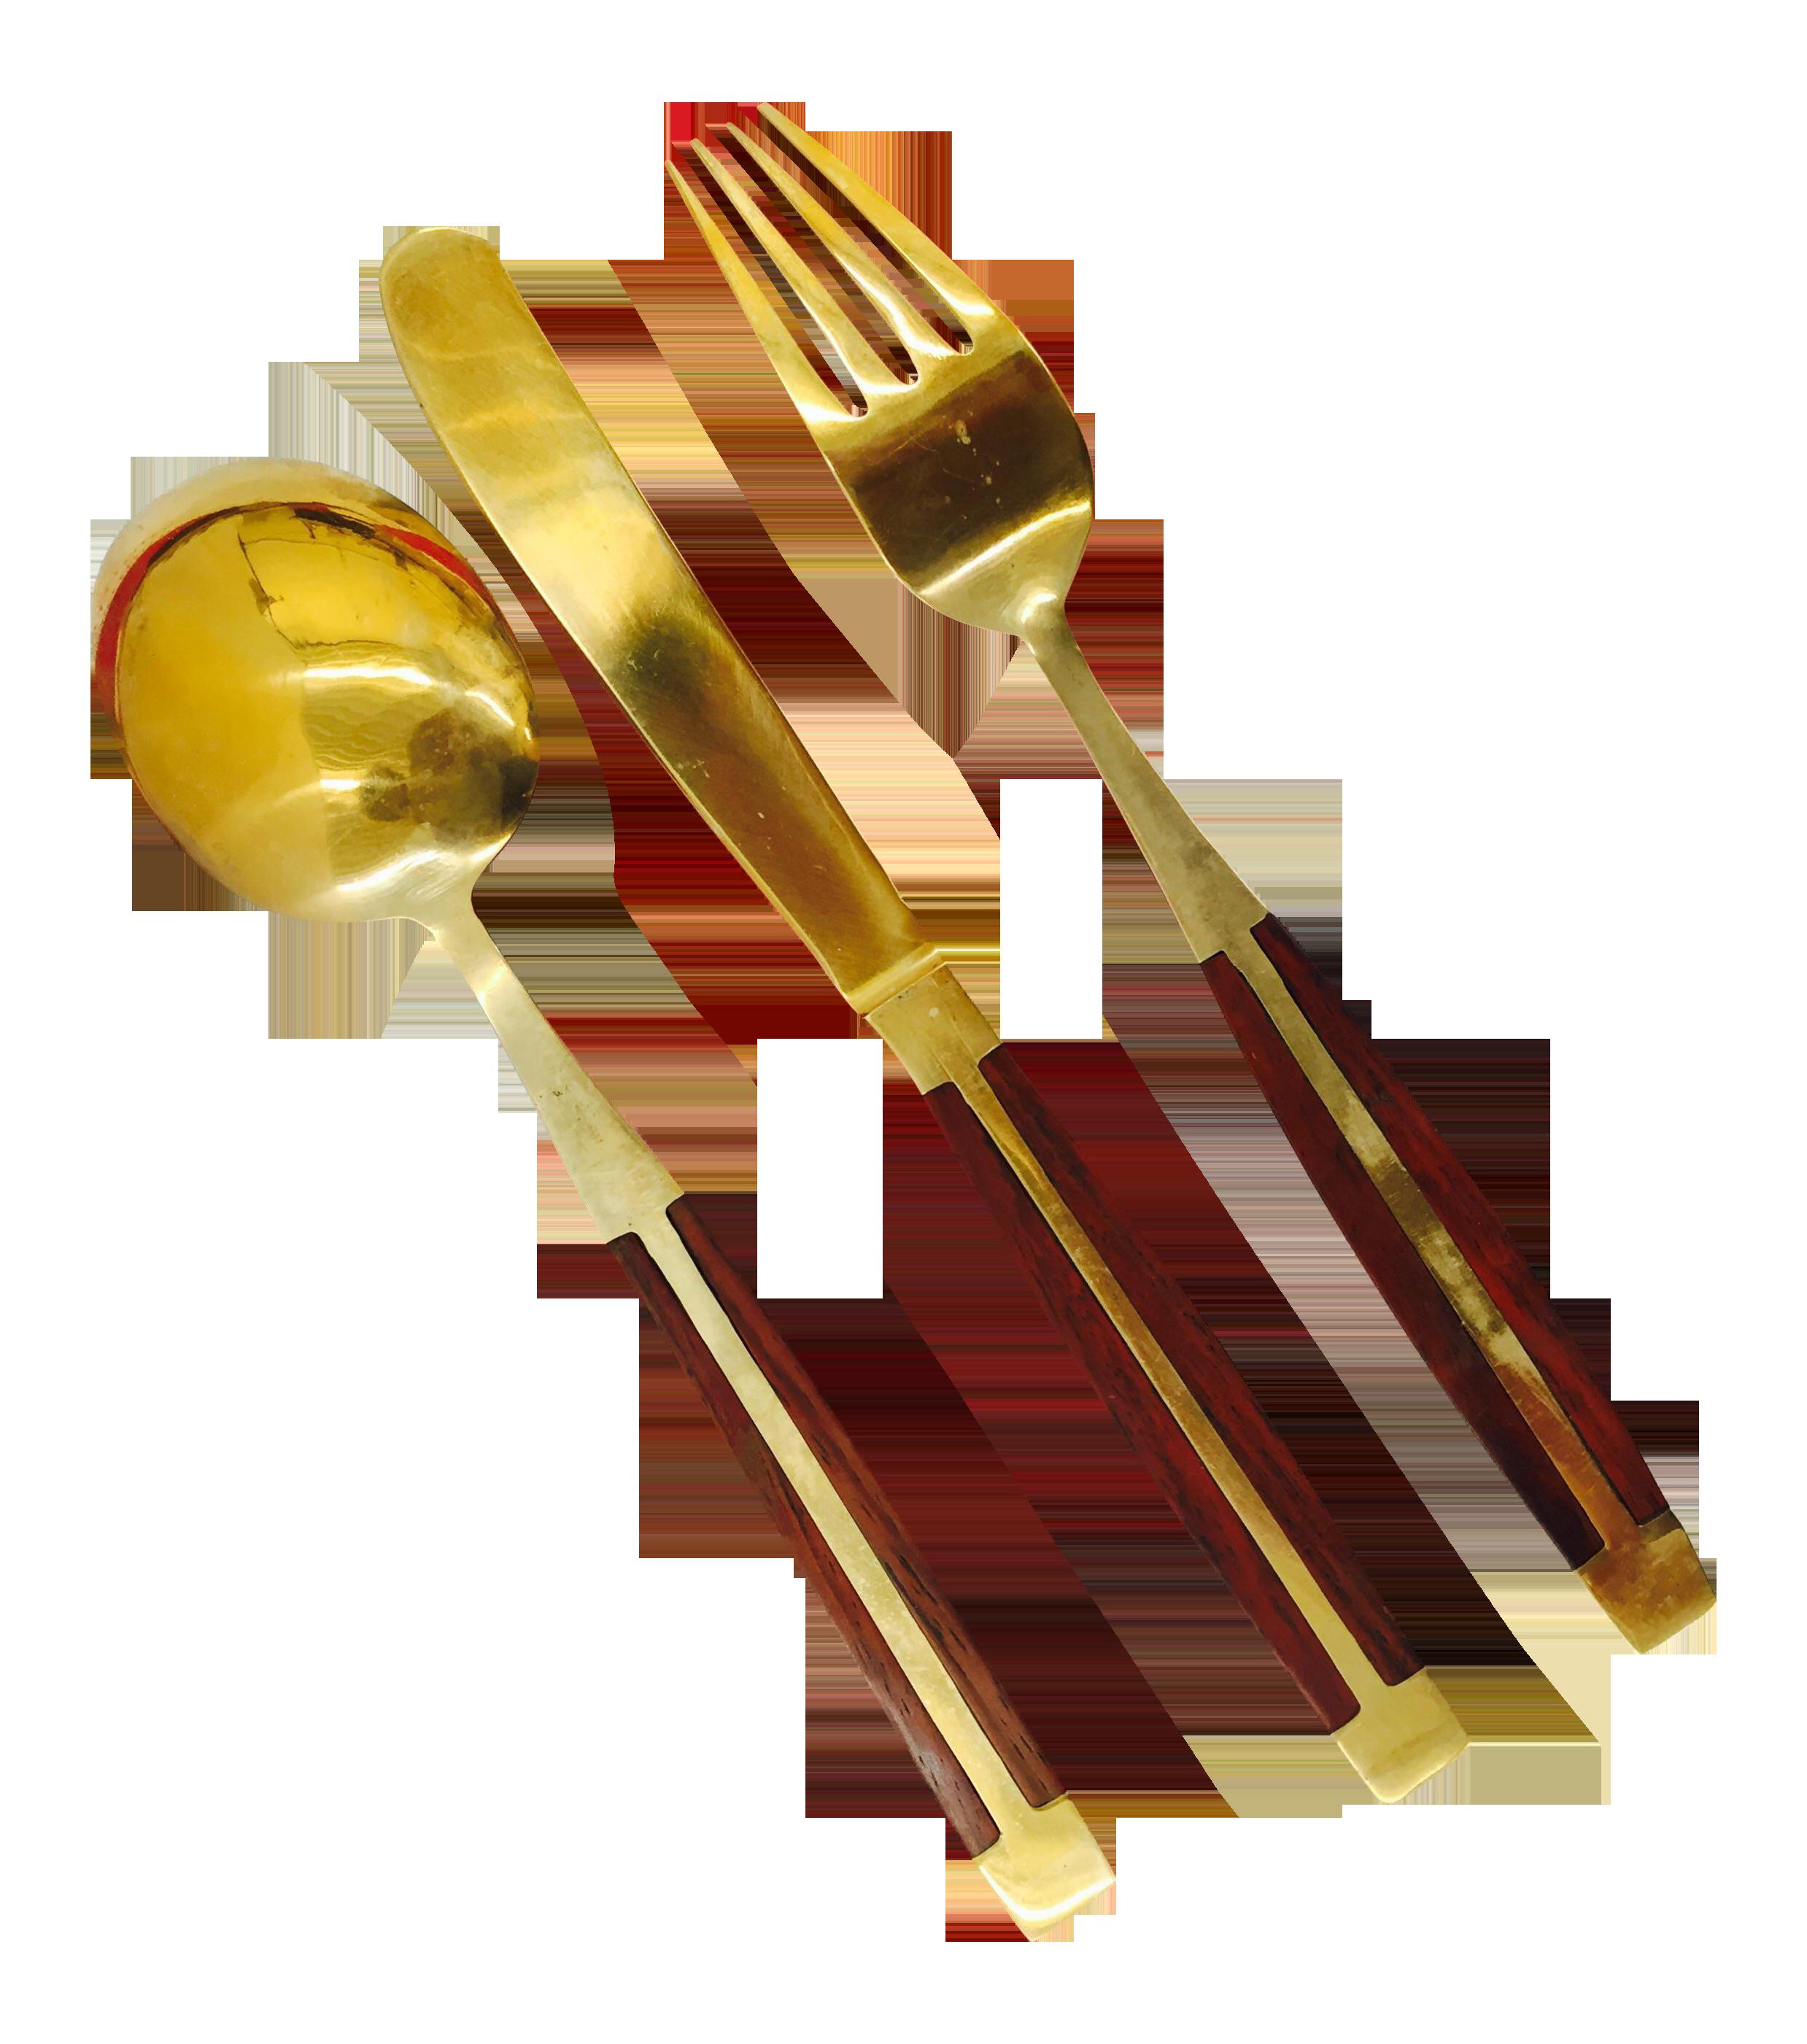 Mid Century Modern Wood amp Brass Flatware Set Set of 18  : b84b9e9f 03d8 46b5 a16c 0bf082fcc7d7aspectfitampwidth640ampheight640 from www.chairish.com size 640 x 640 jpeg 35kB